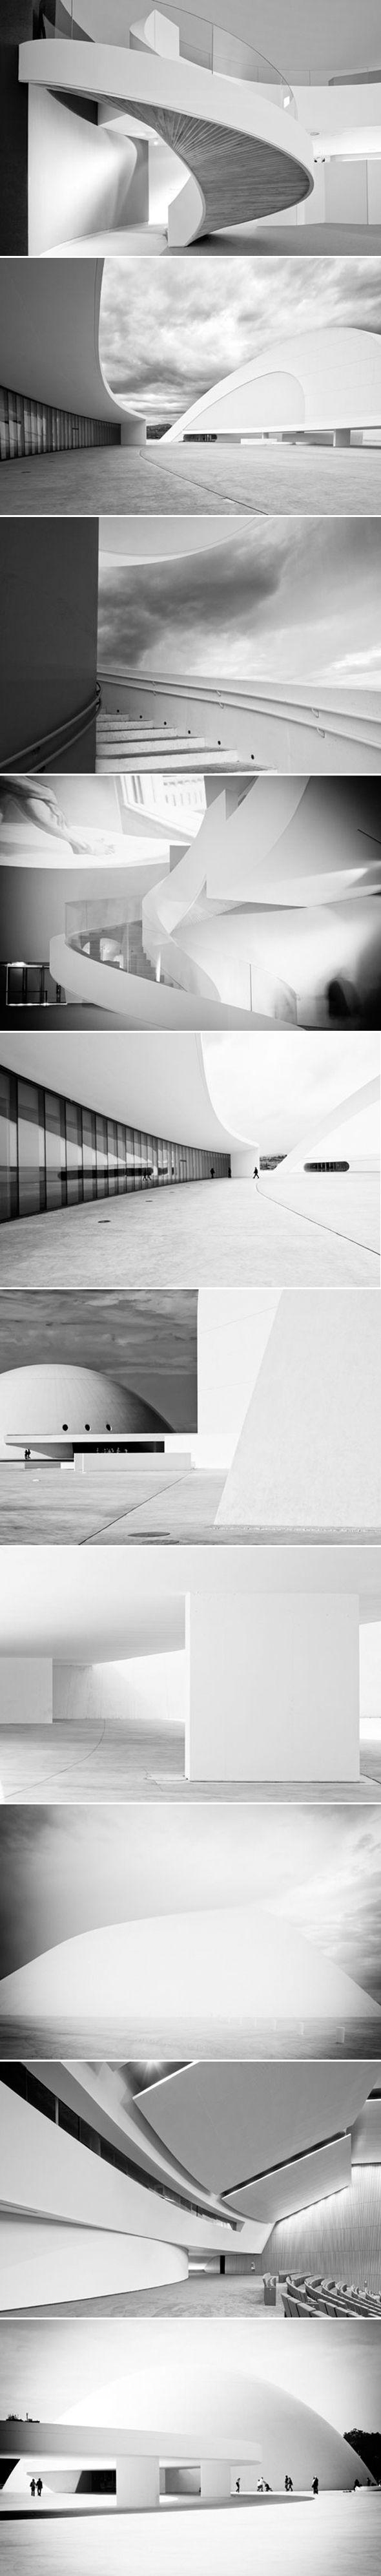 Centro Niemeyer por Danica Ocvirk Kus